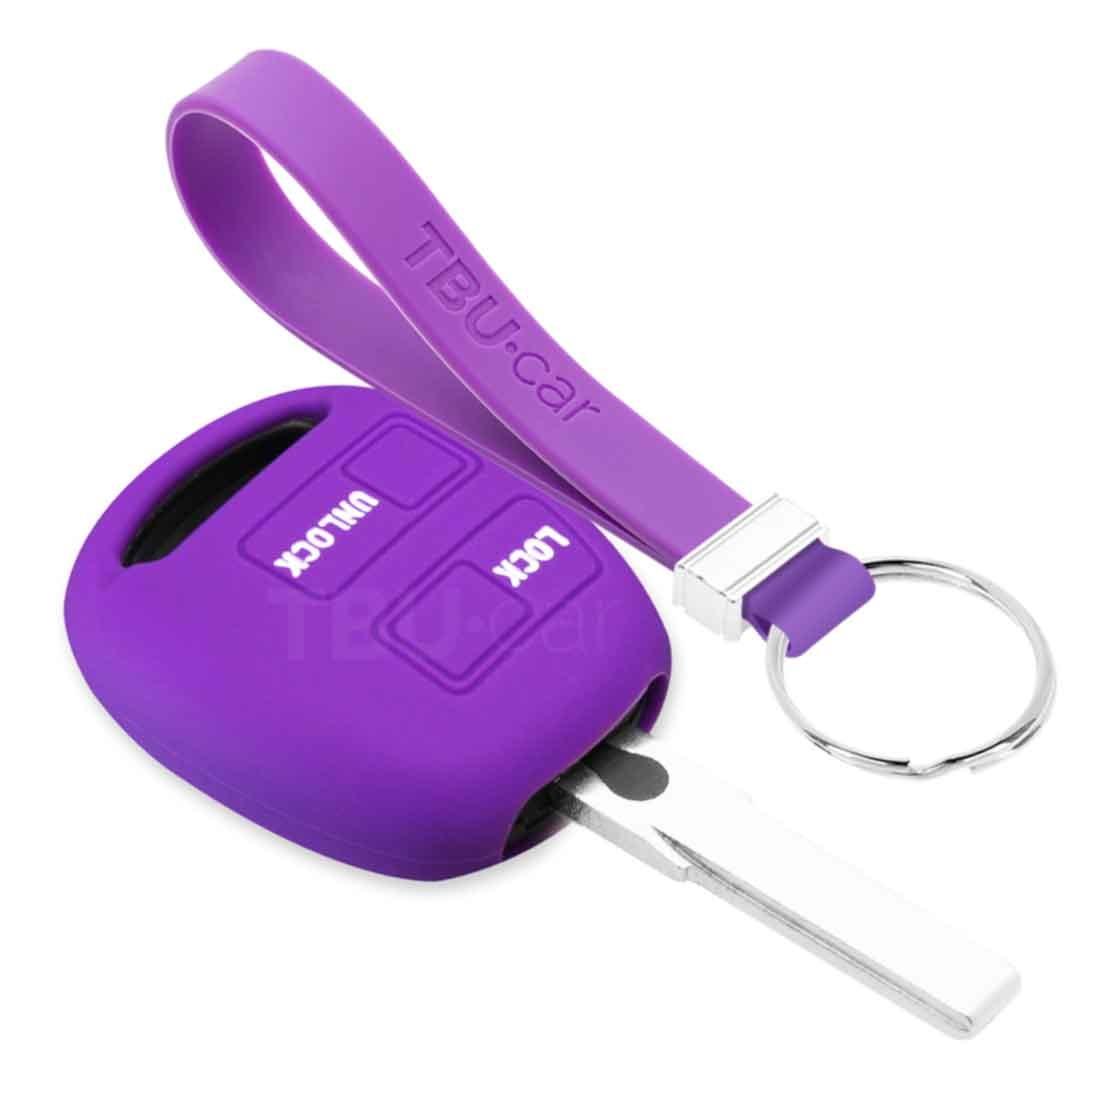 TBU car TBU car Sleutel cover compatibel met Lexus - Silicone sleutelhoesje - beschermhoesje autosleutel - Paars